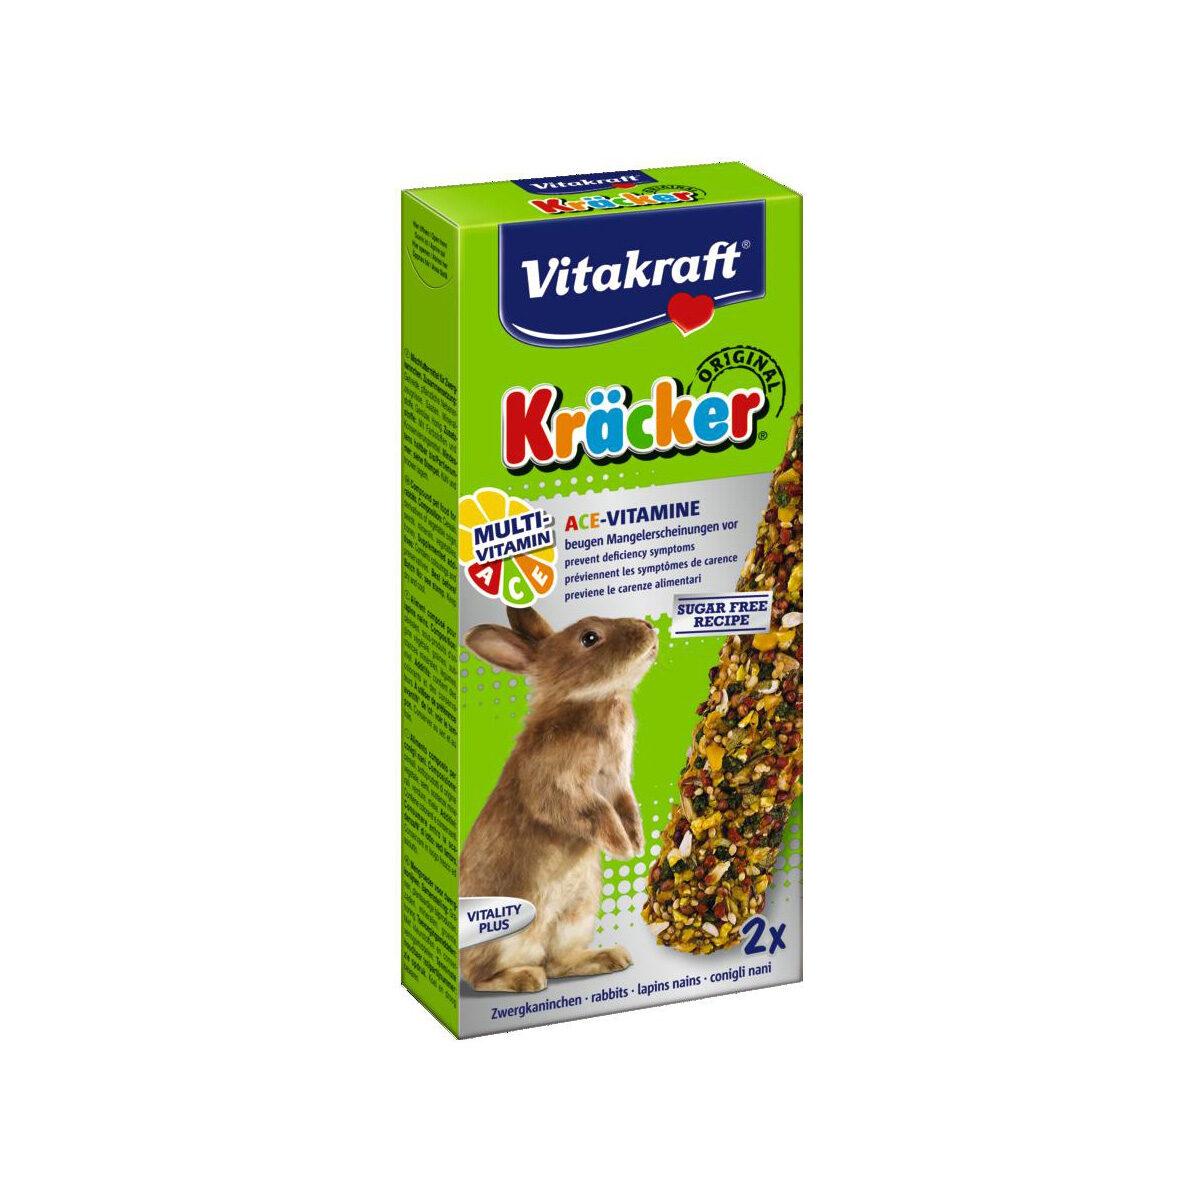 Vitakraft Kräcker Konijnensnack 2-in-1 Multi-Vitamine